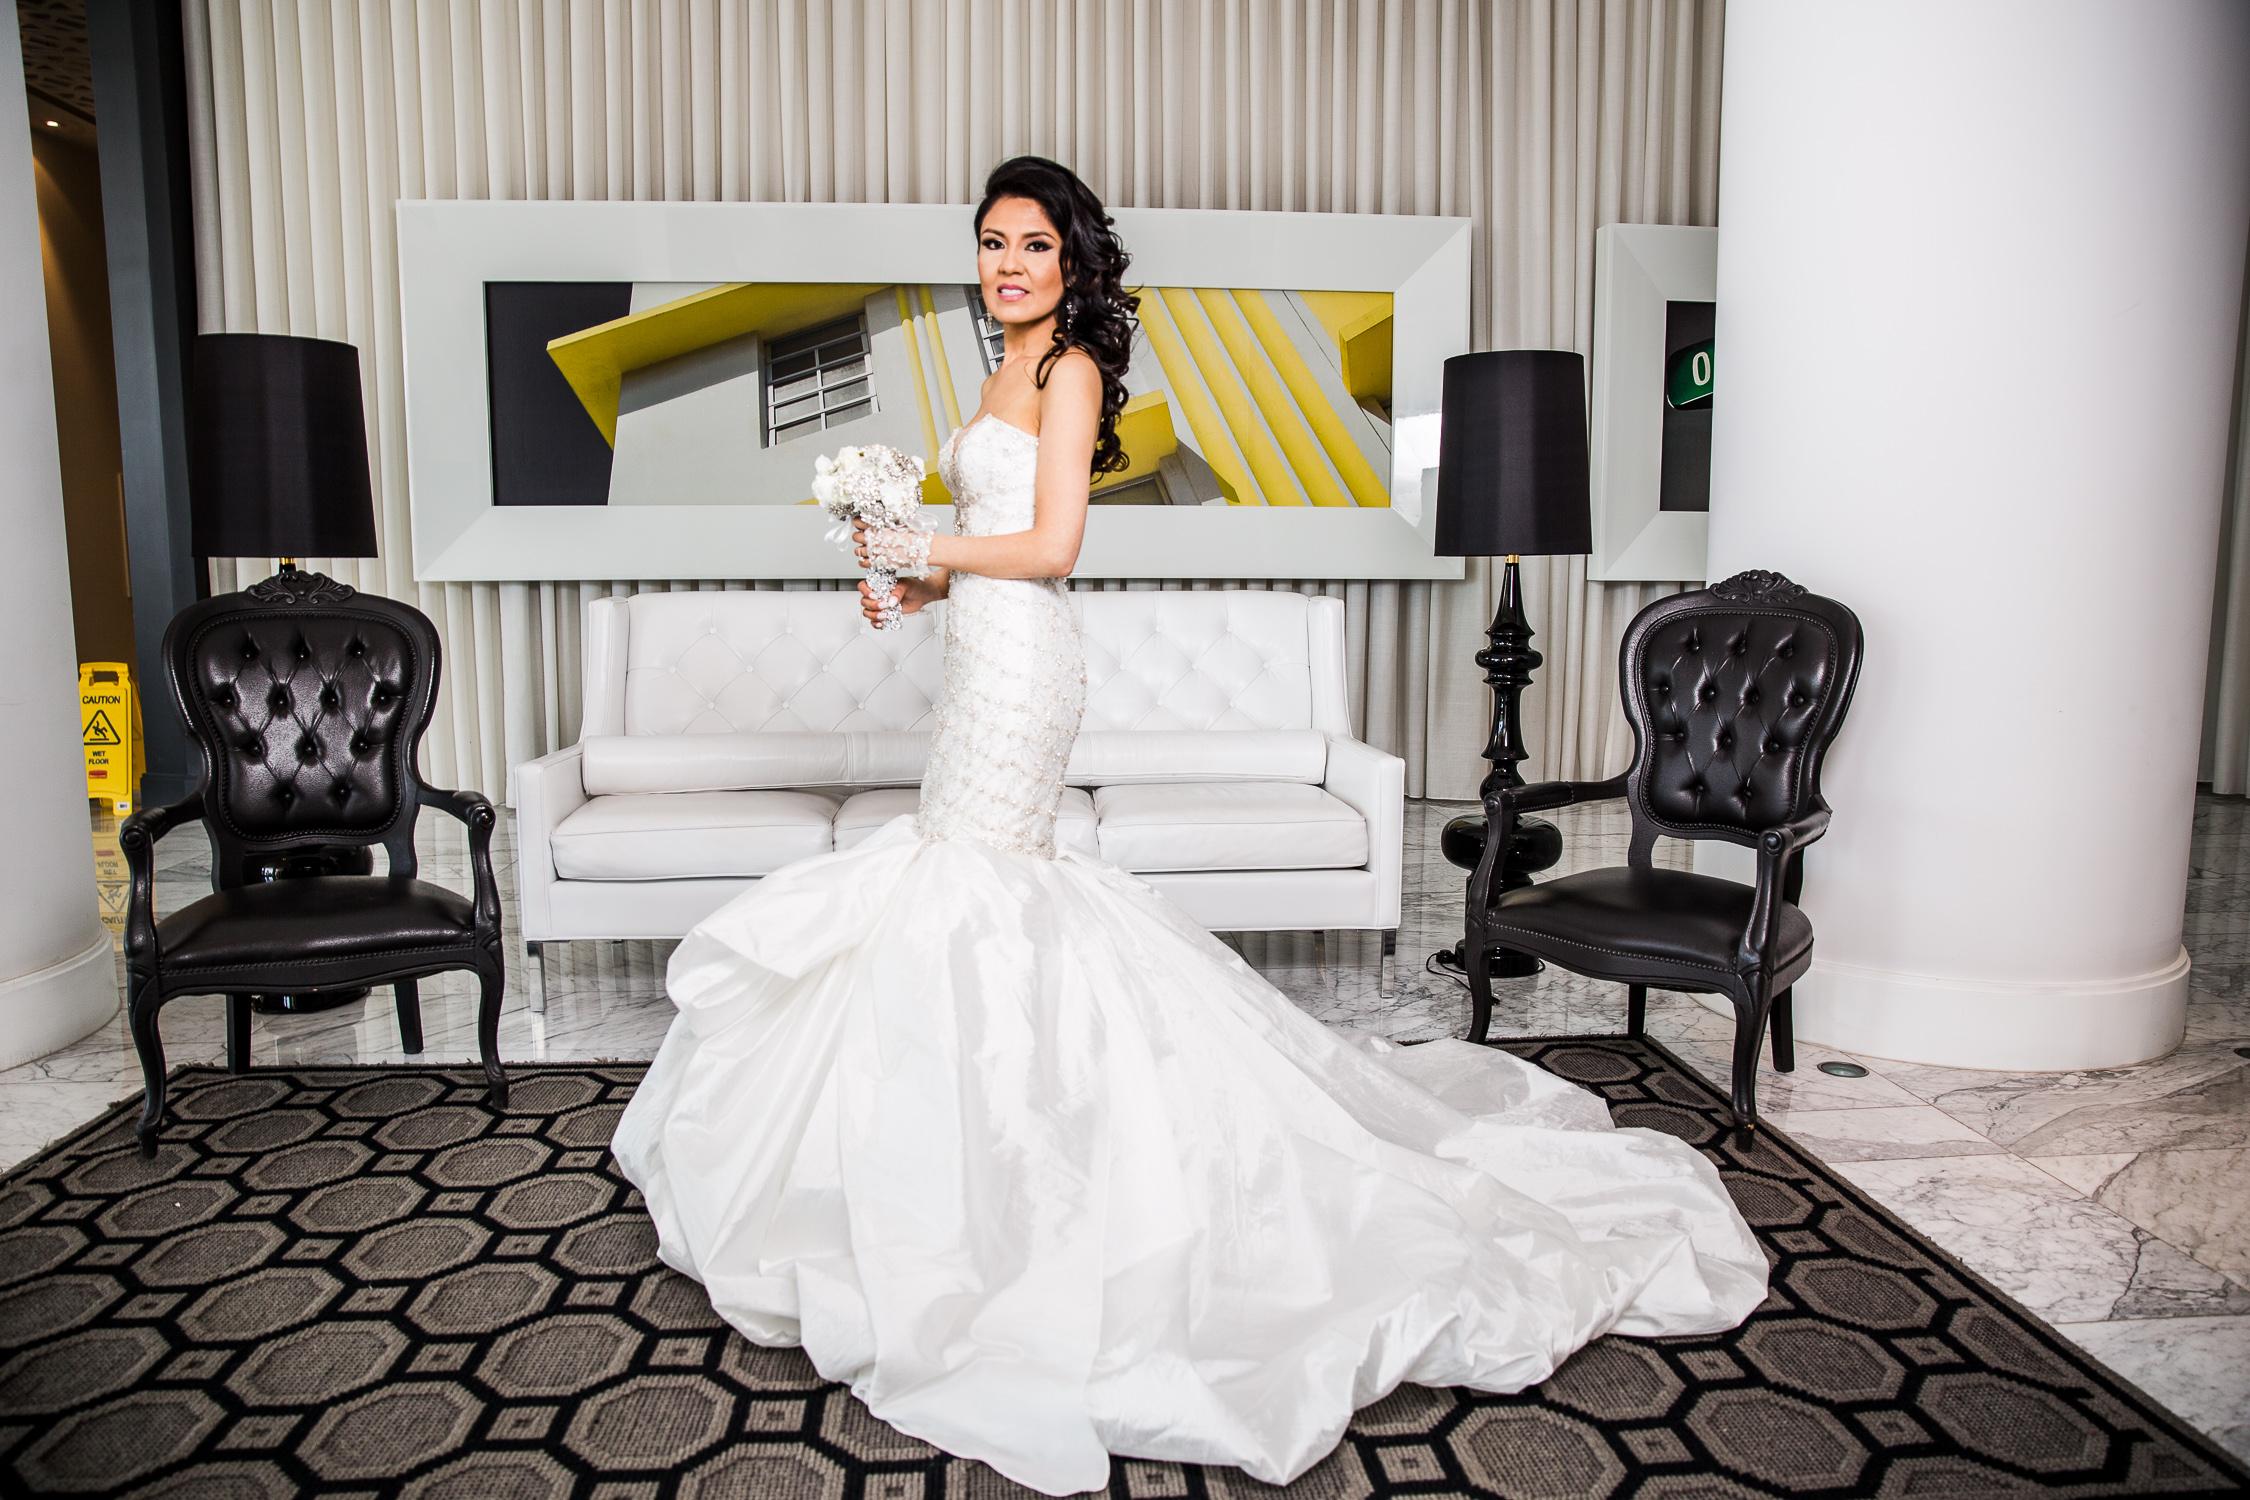 Paradise-Banquet-Hall-Wedding-Vaughan-Ontario-0016.jpg